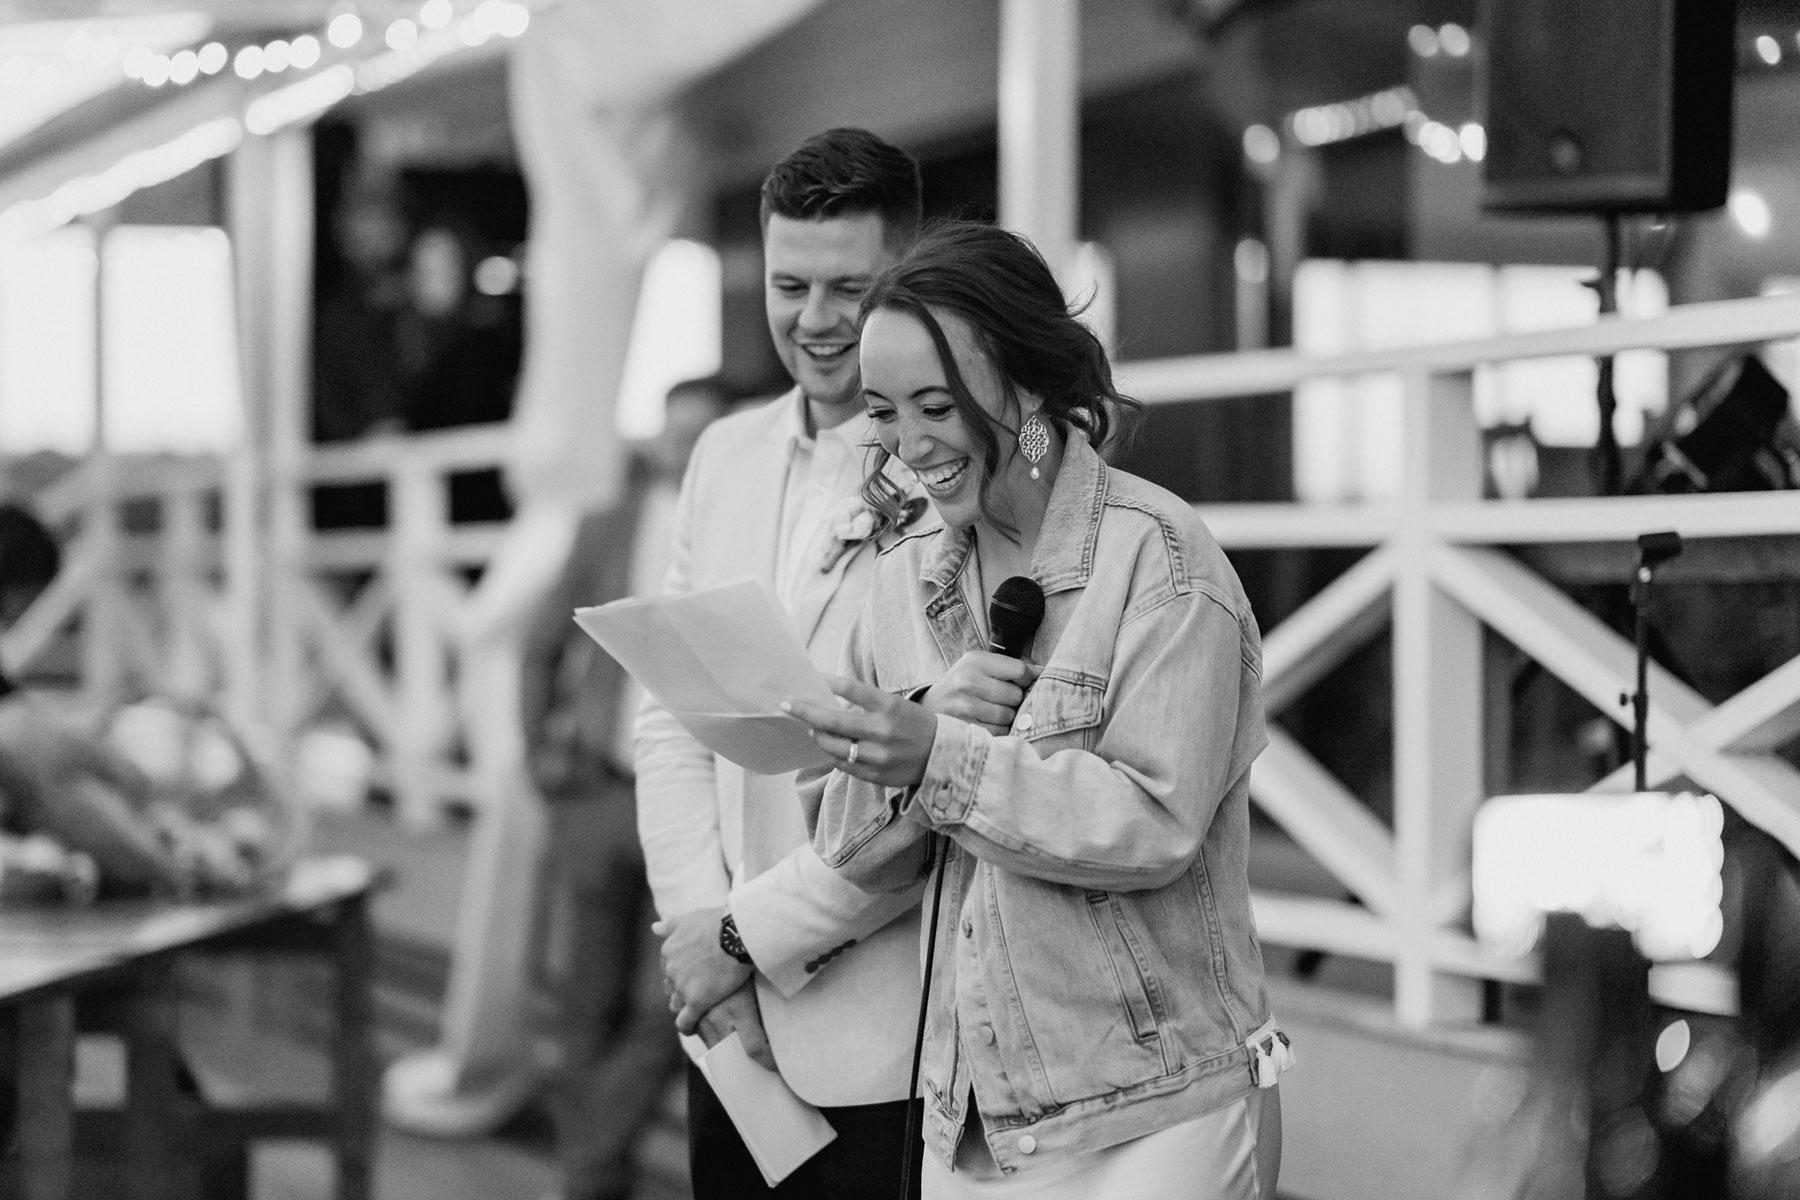 newfound-j-n-orua-beach-house-coromandel-wedding-photographers-833A